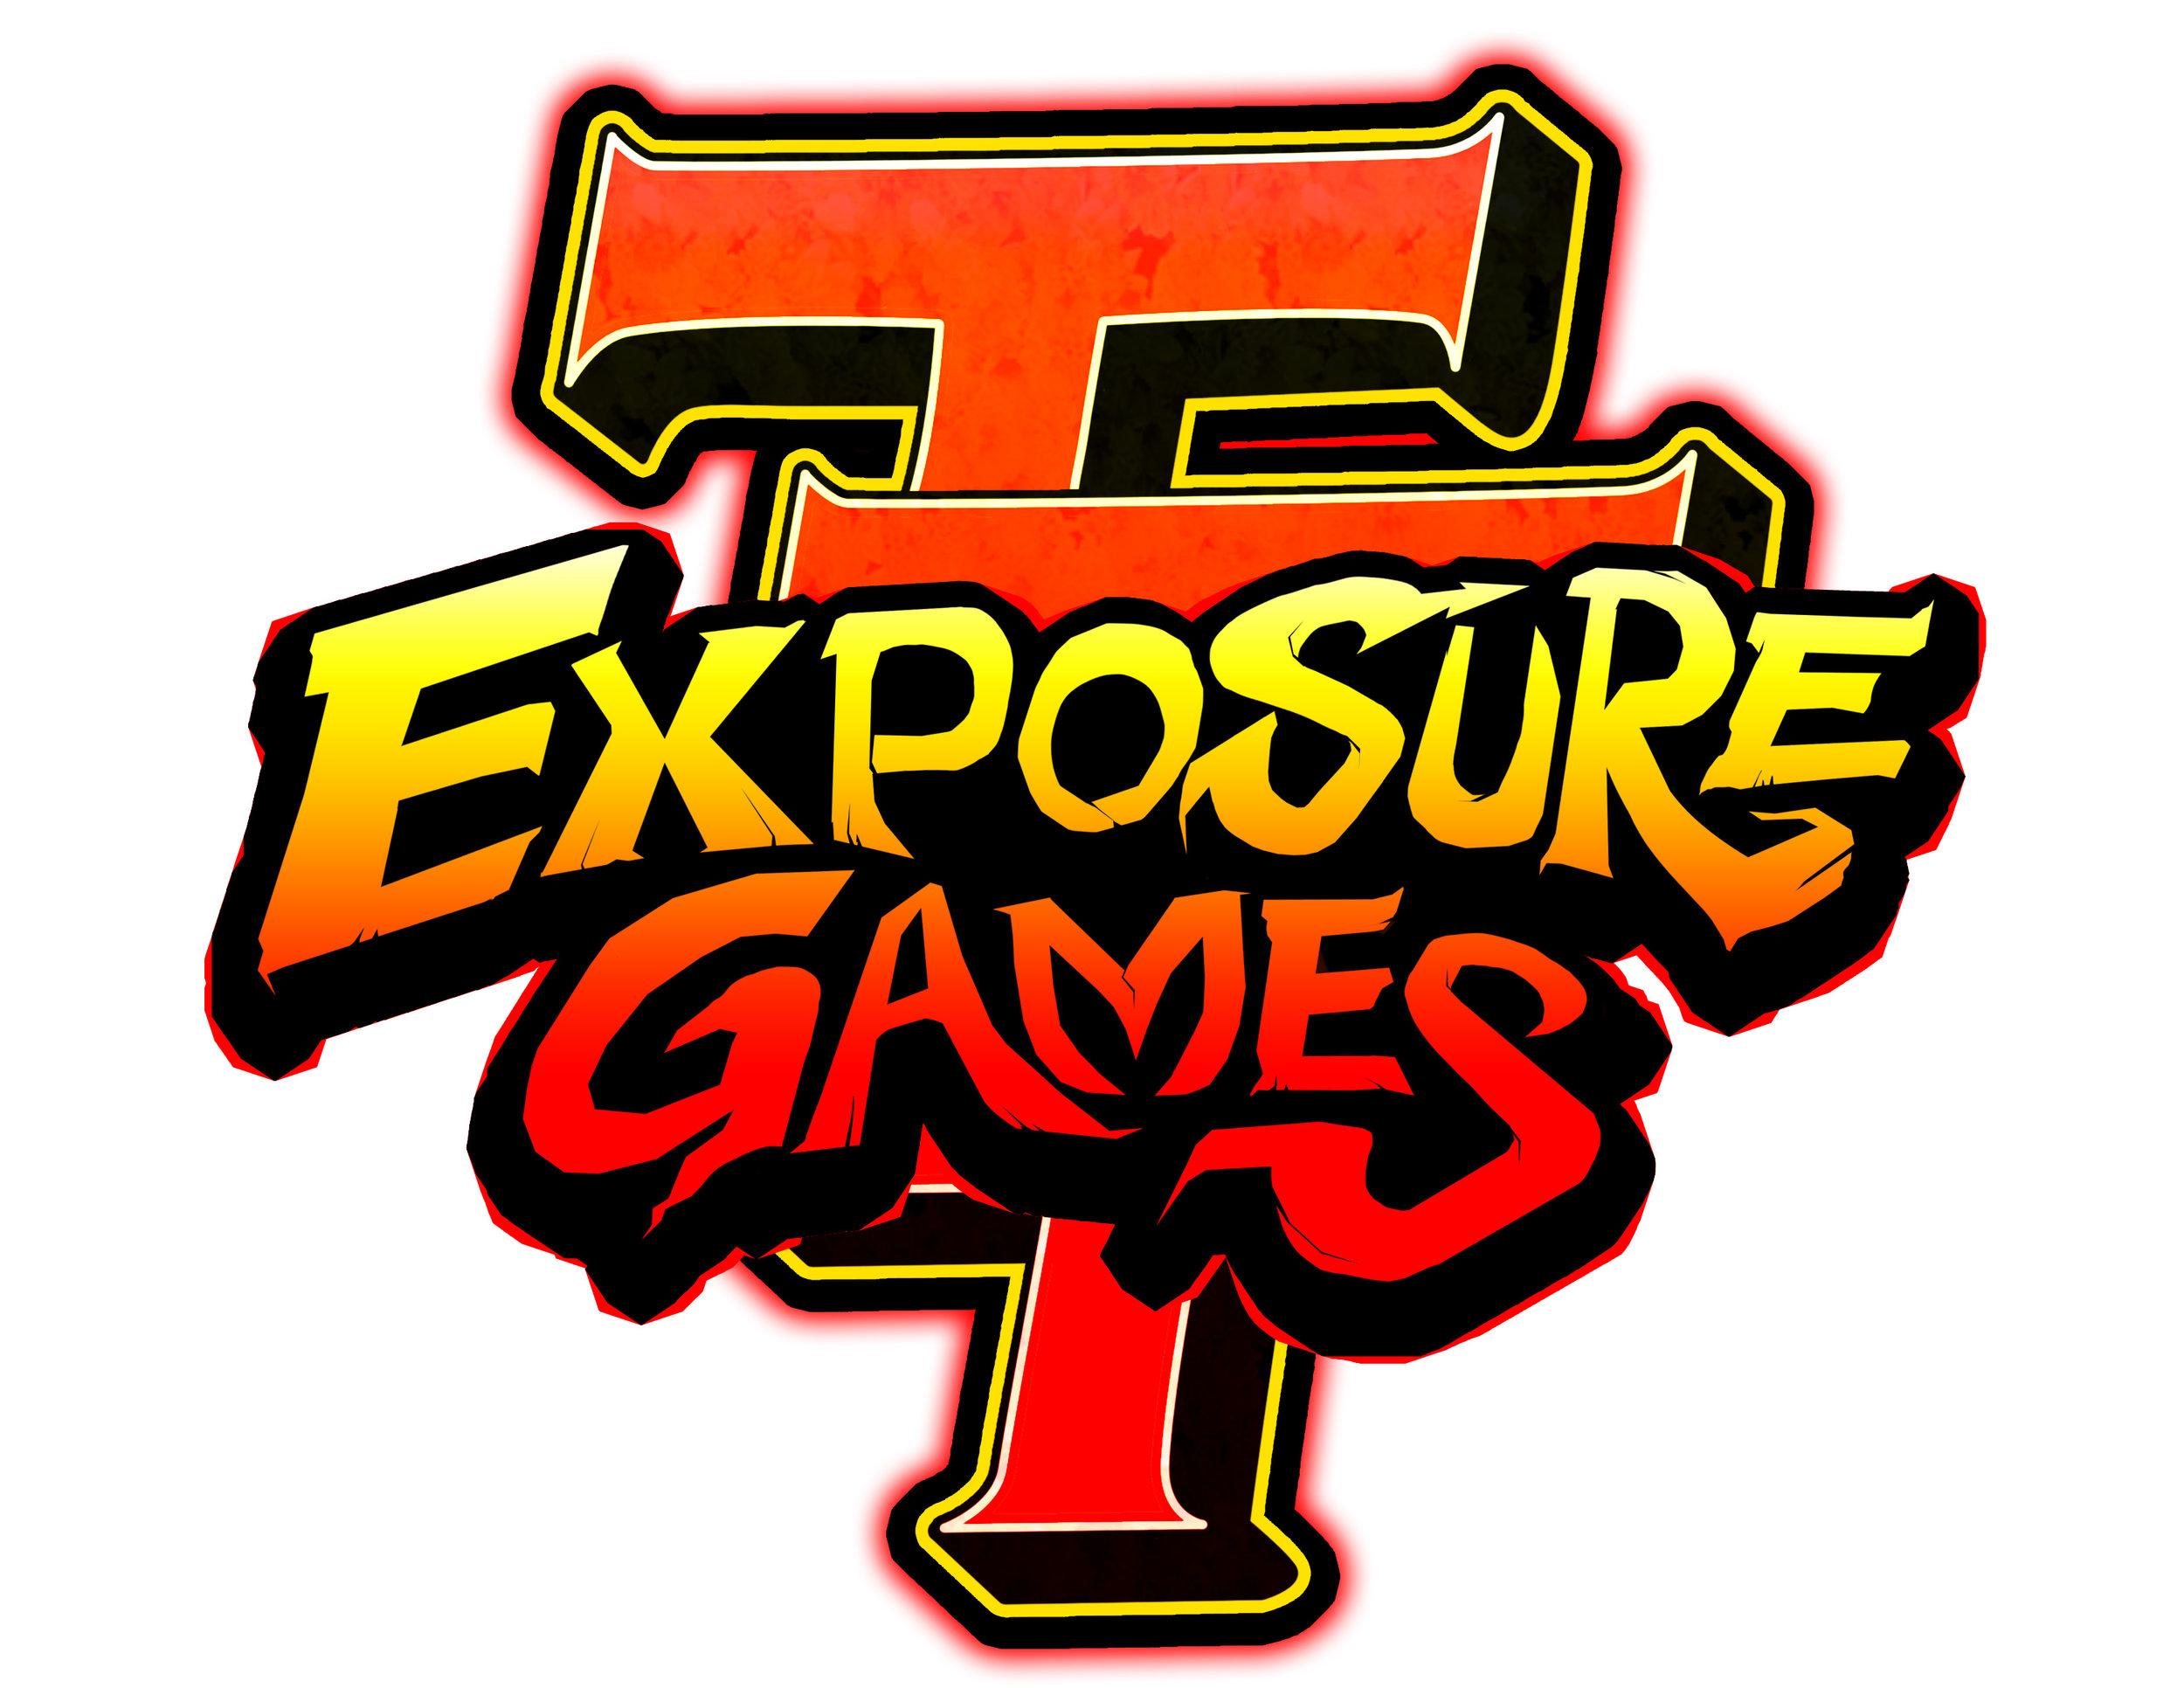 ExposureGames_TotalRemake.jpg